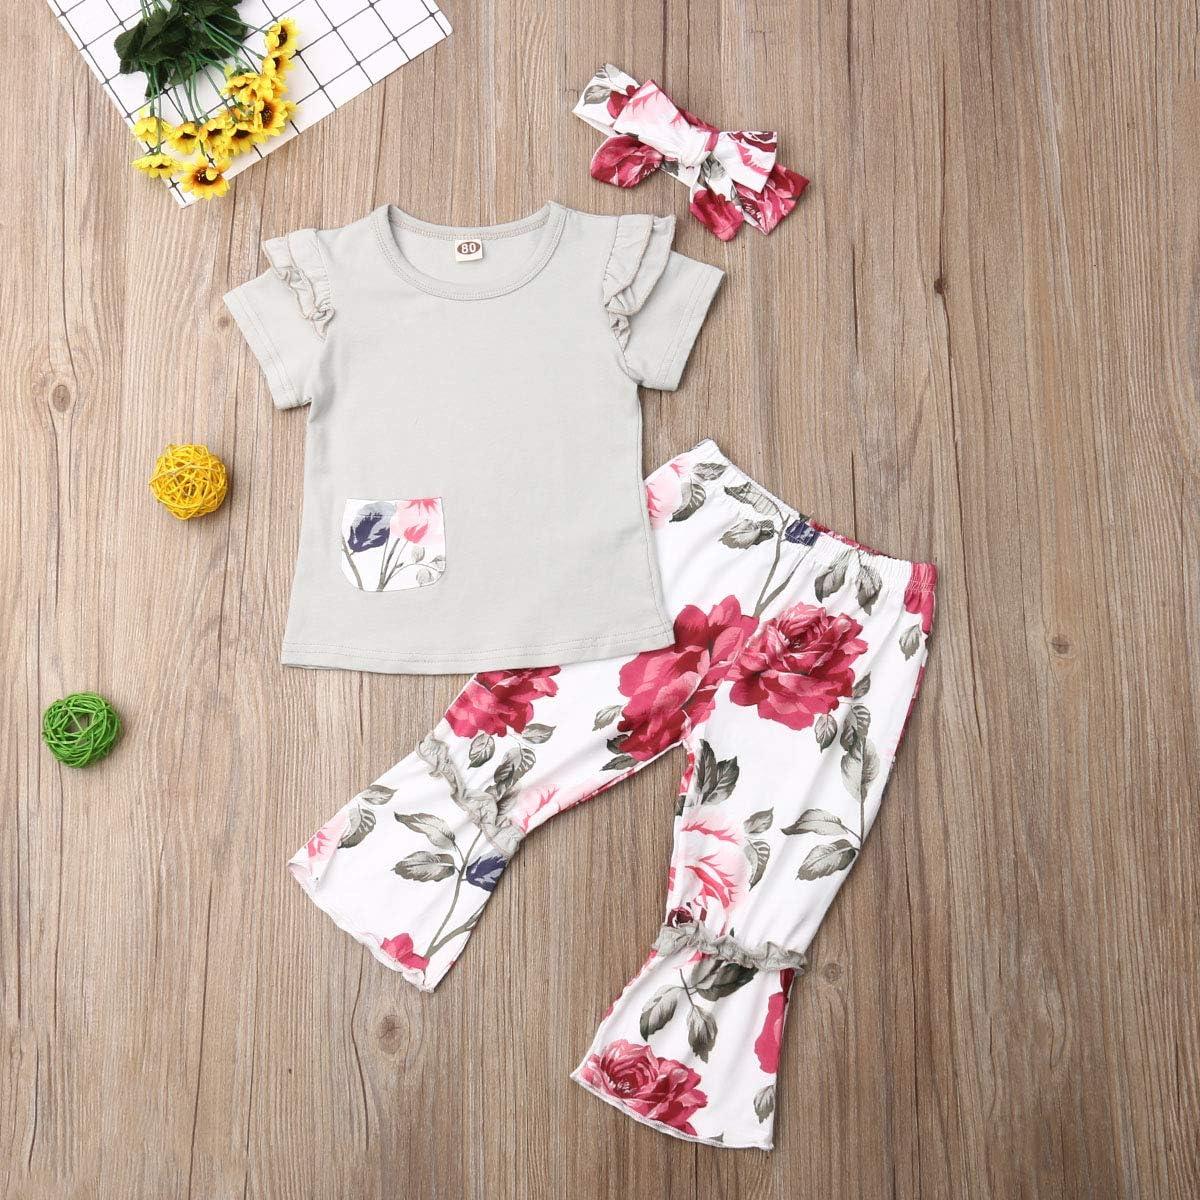 Newborn Infant Baby Girl Clothes Pocket Flower Ruffle Short Sleeve T-Shirt Top+Floral Pants Headband Outfits Set